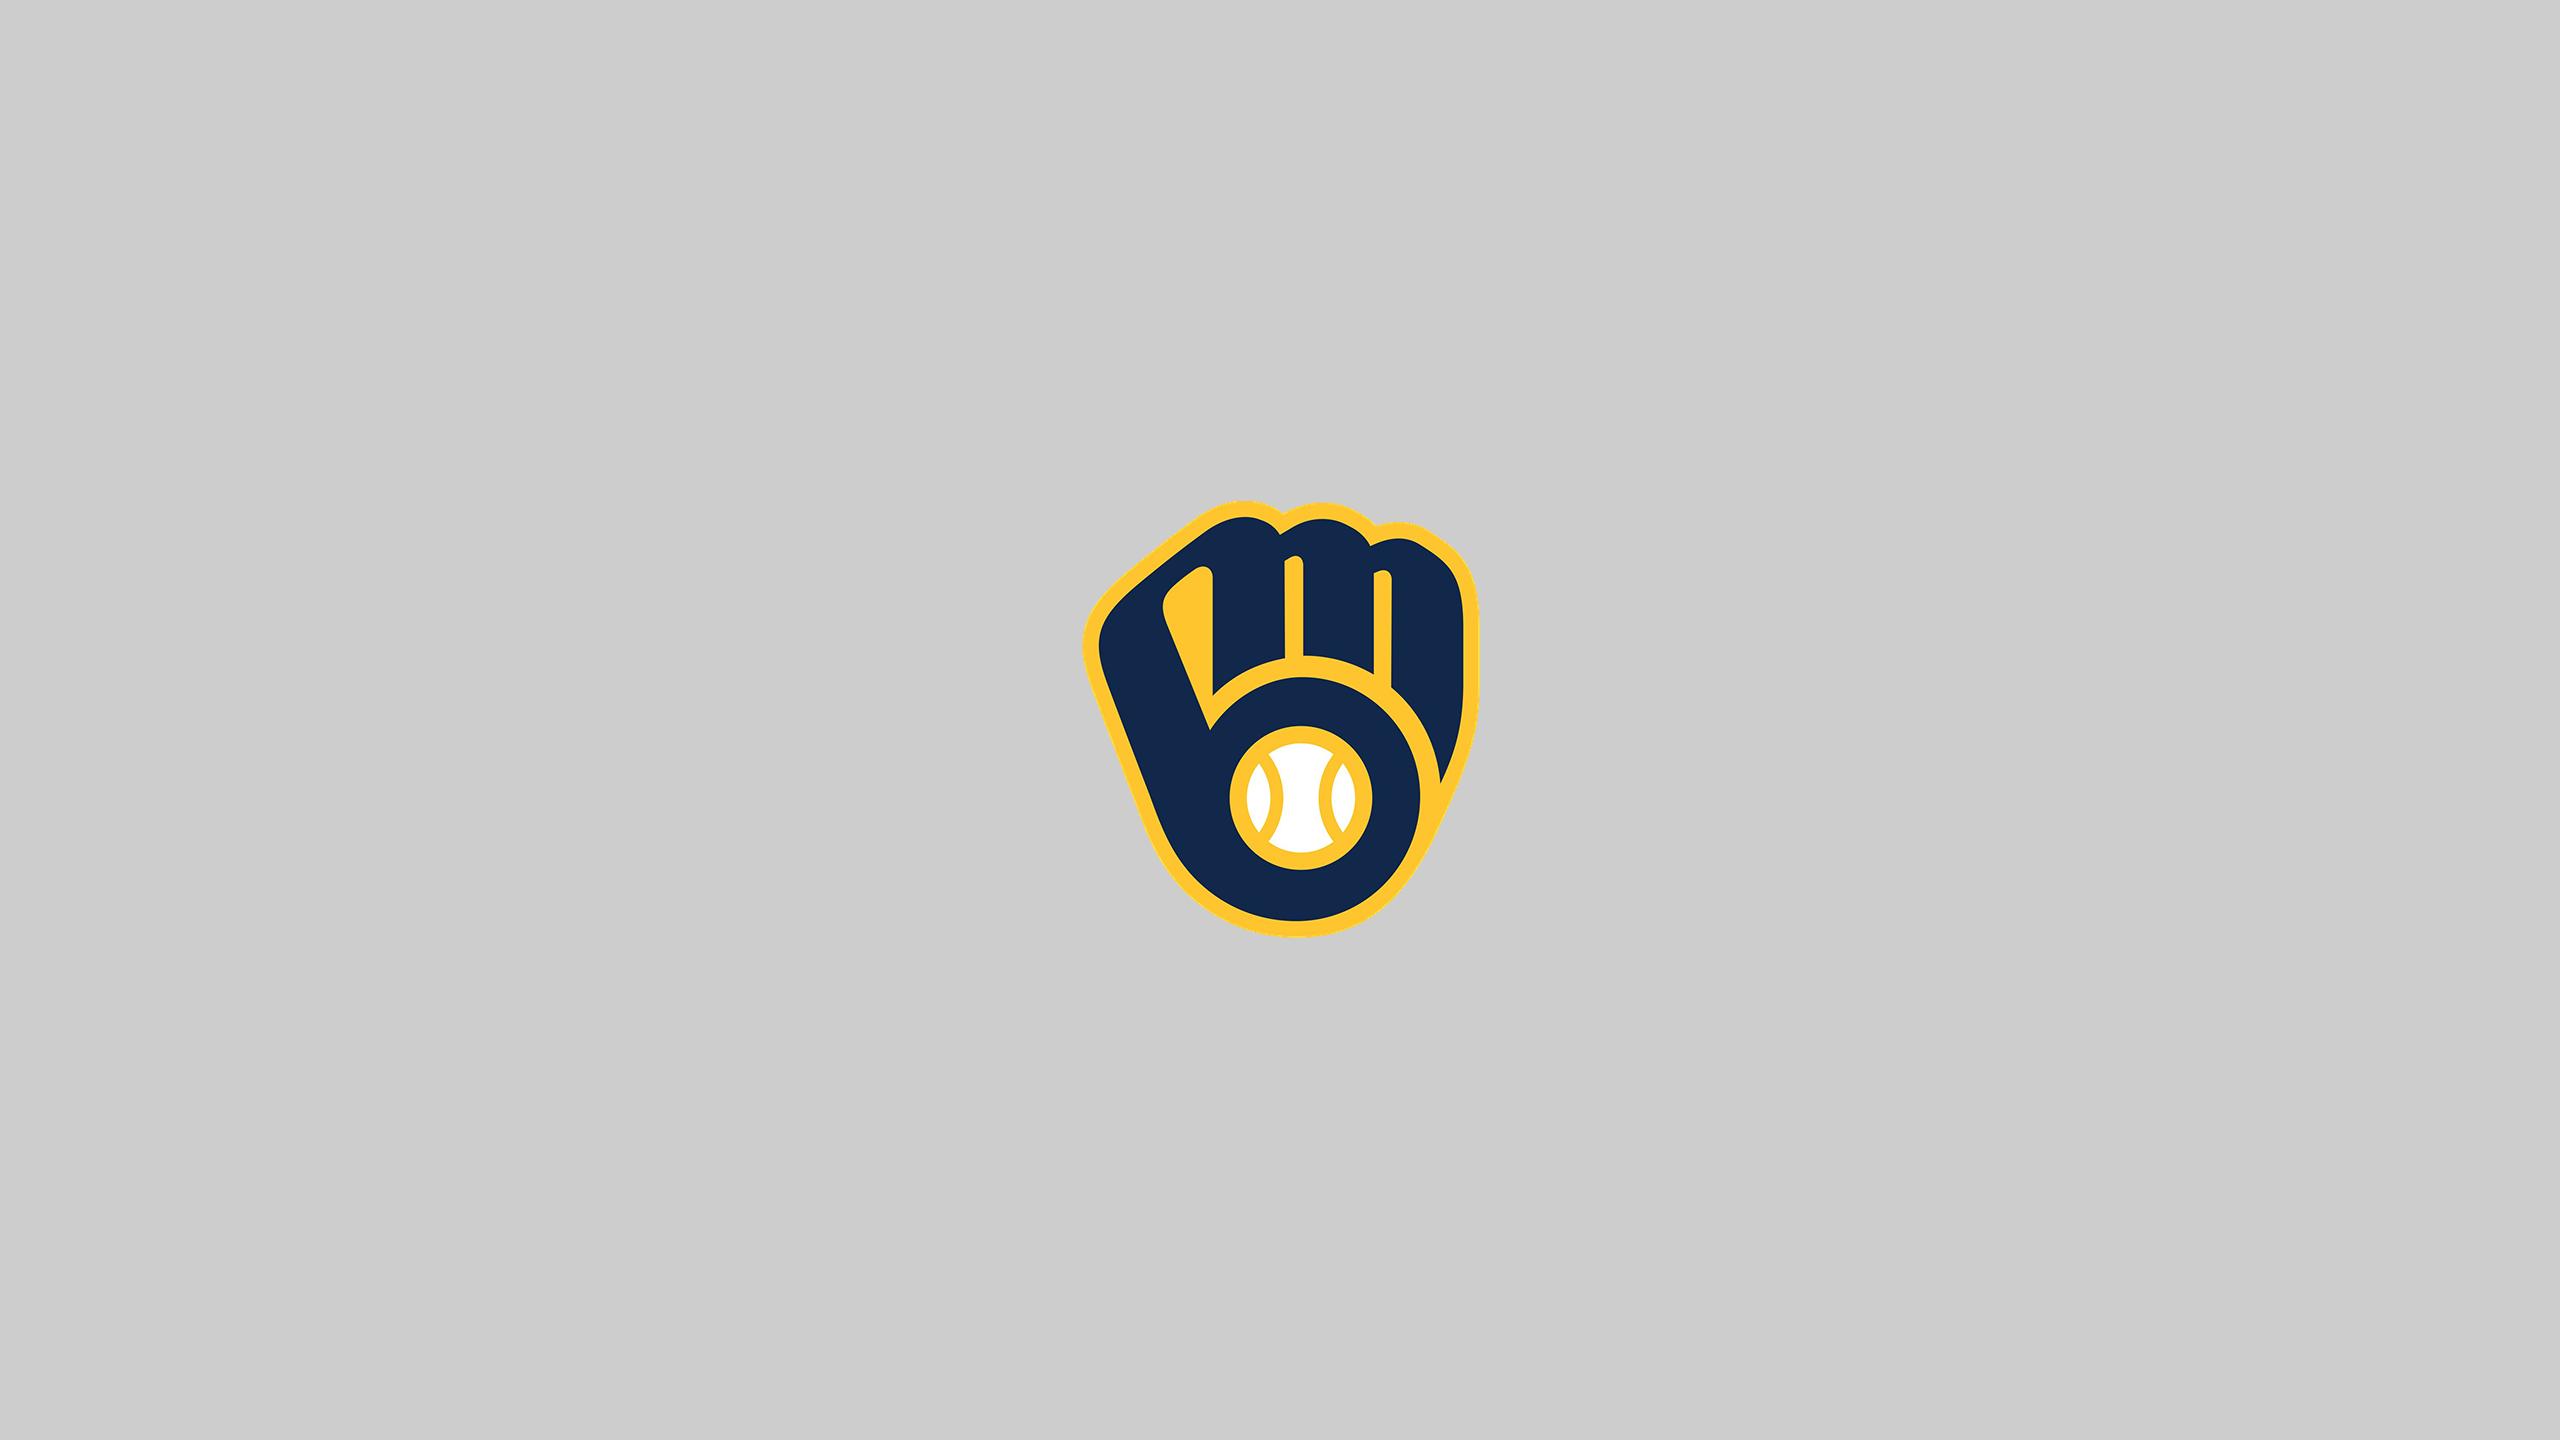 Milwaukee Brewers (Away)